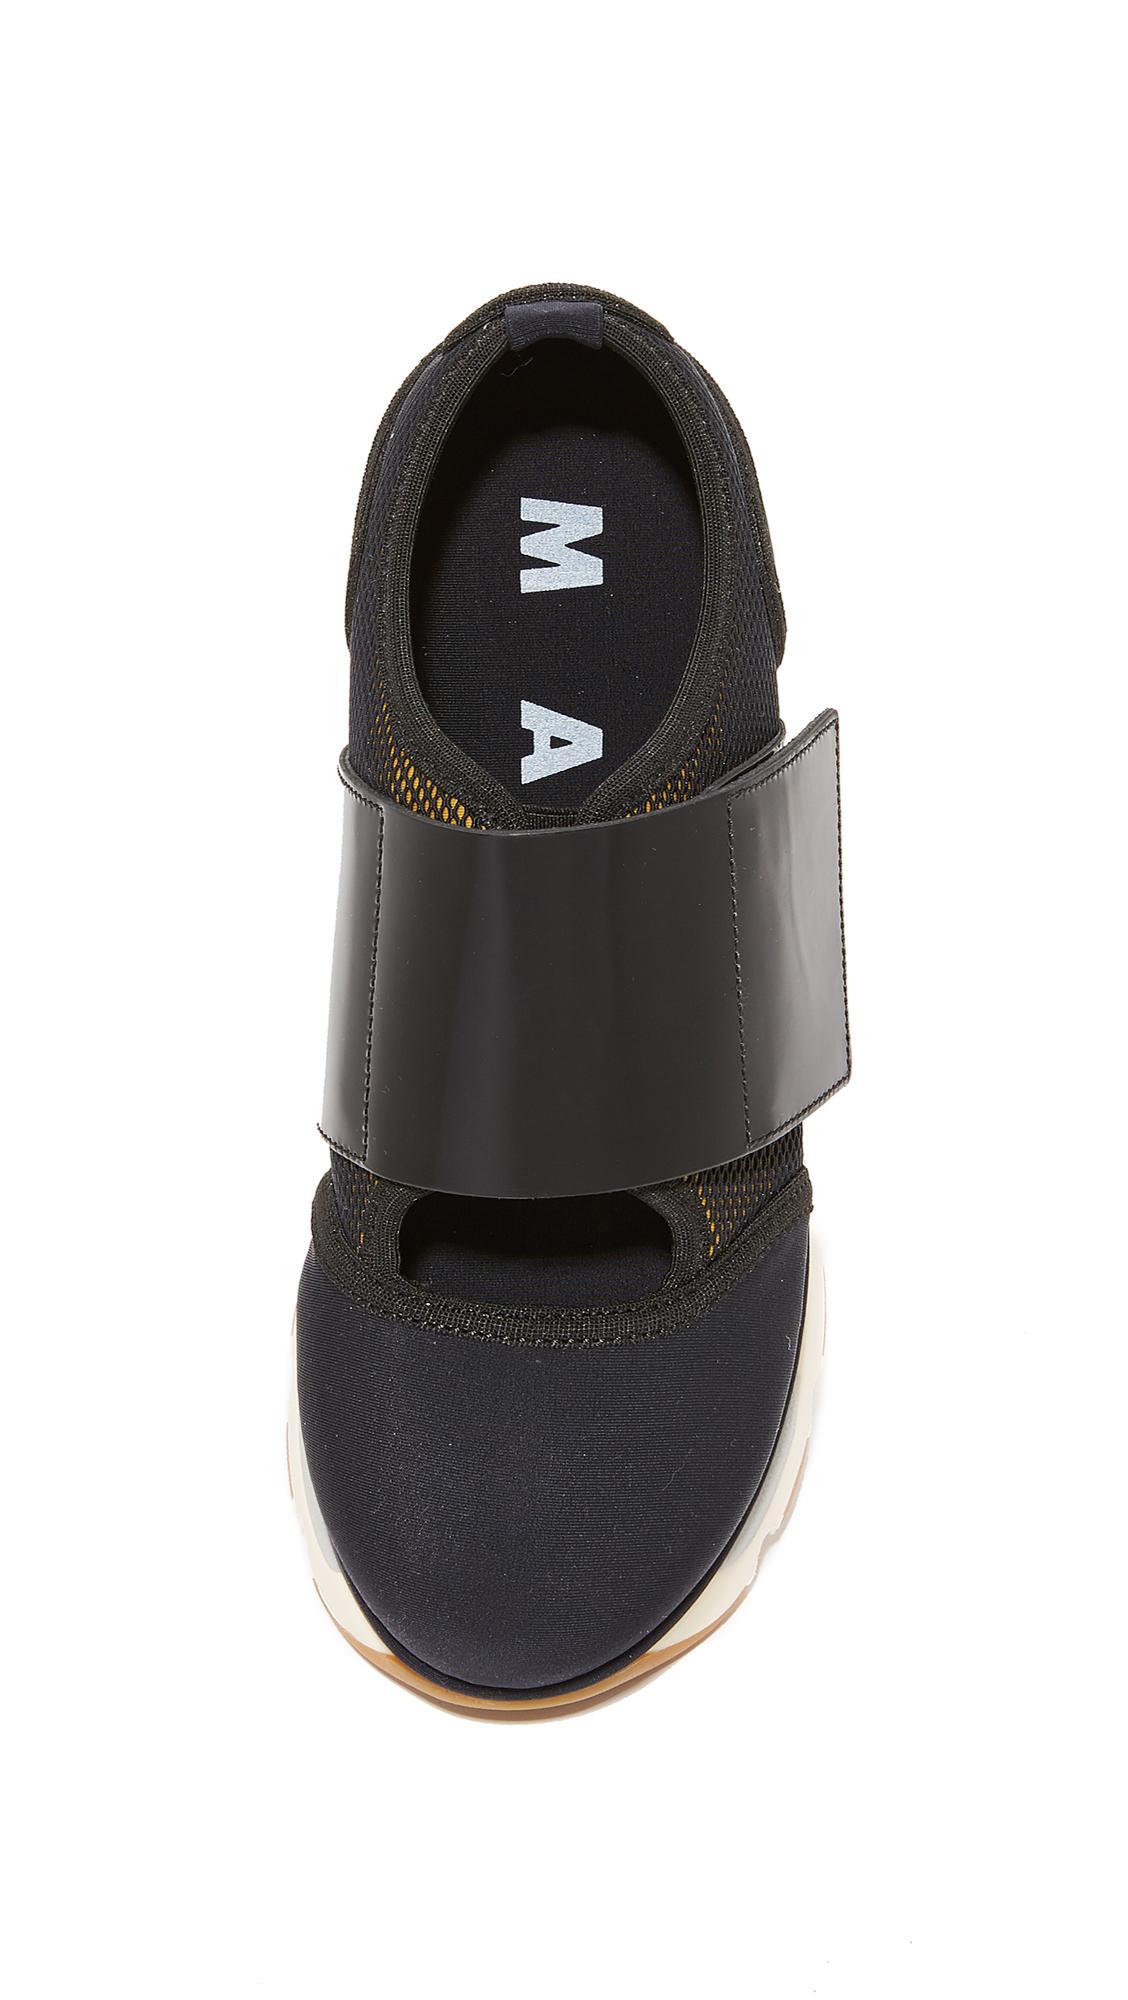 Marni Leather Platform Sneakers in Black/Black (Black)